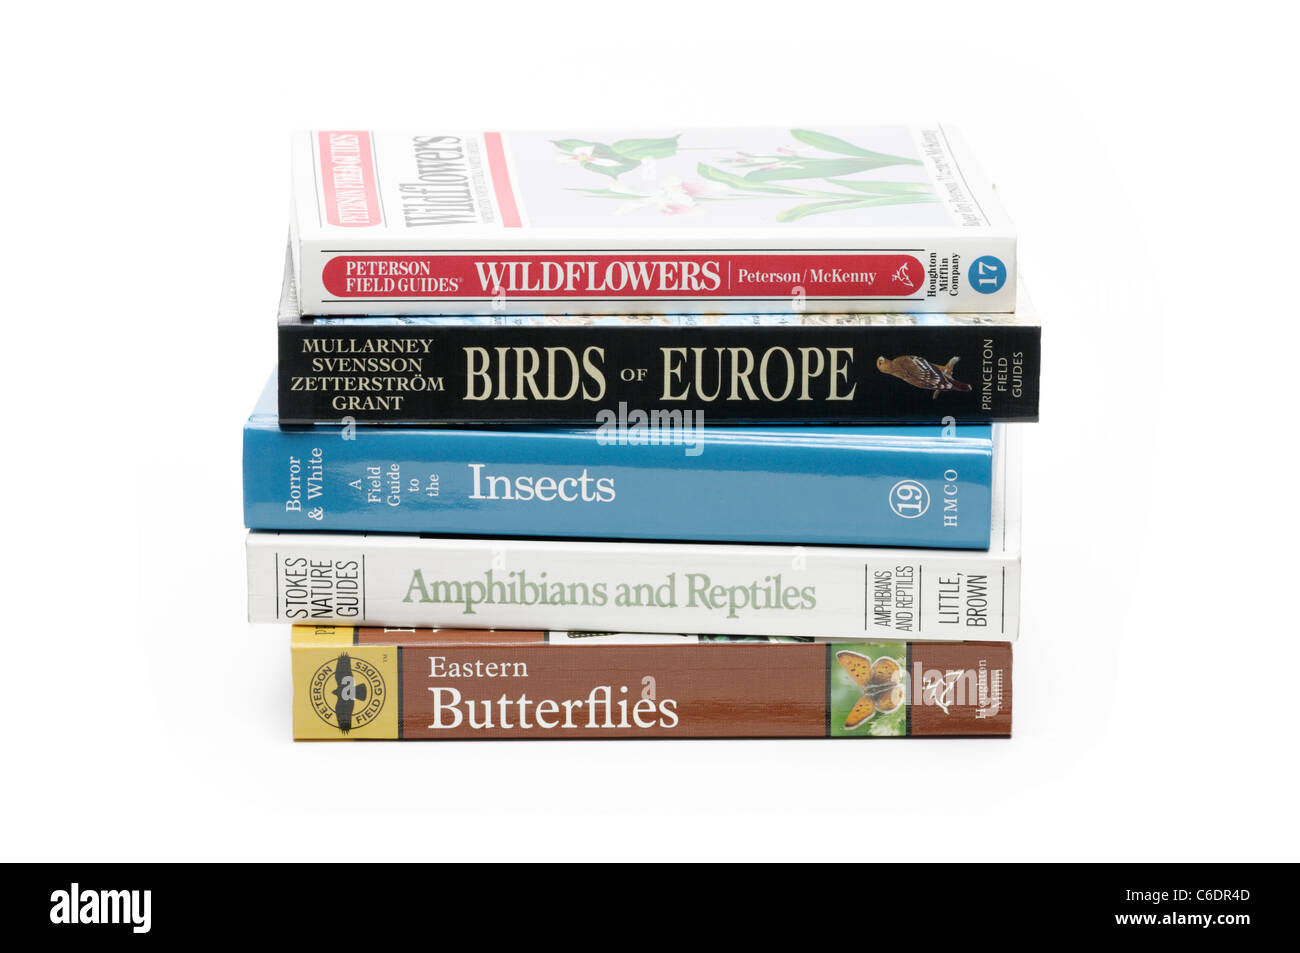 Books for identifying wildlife - Stock Image